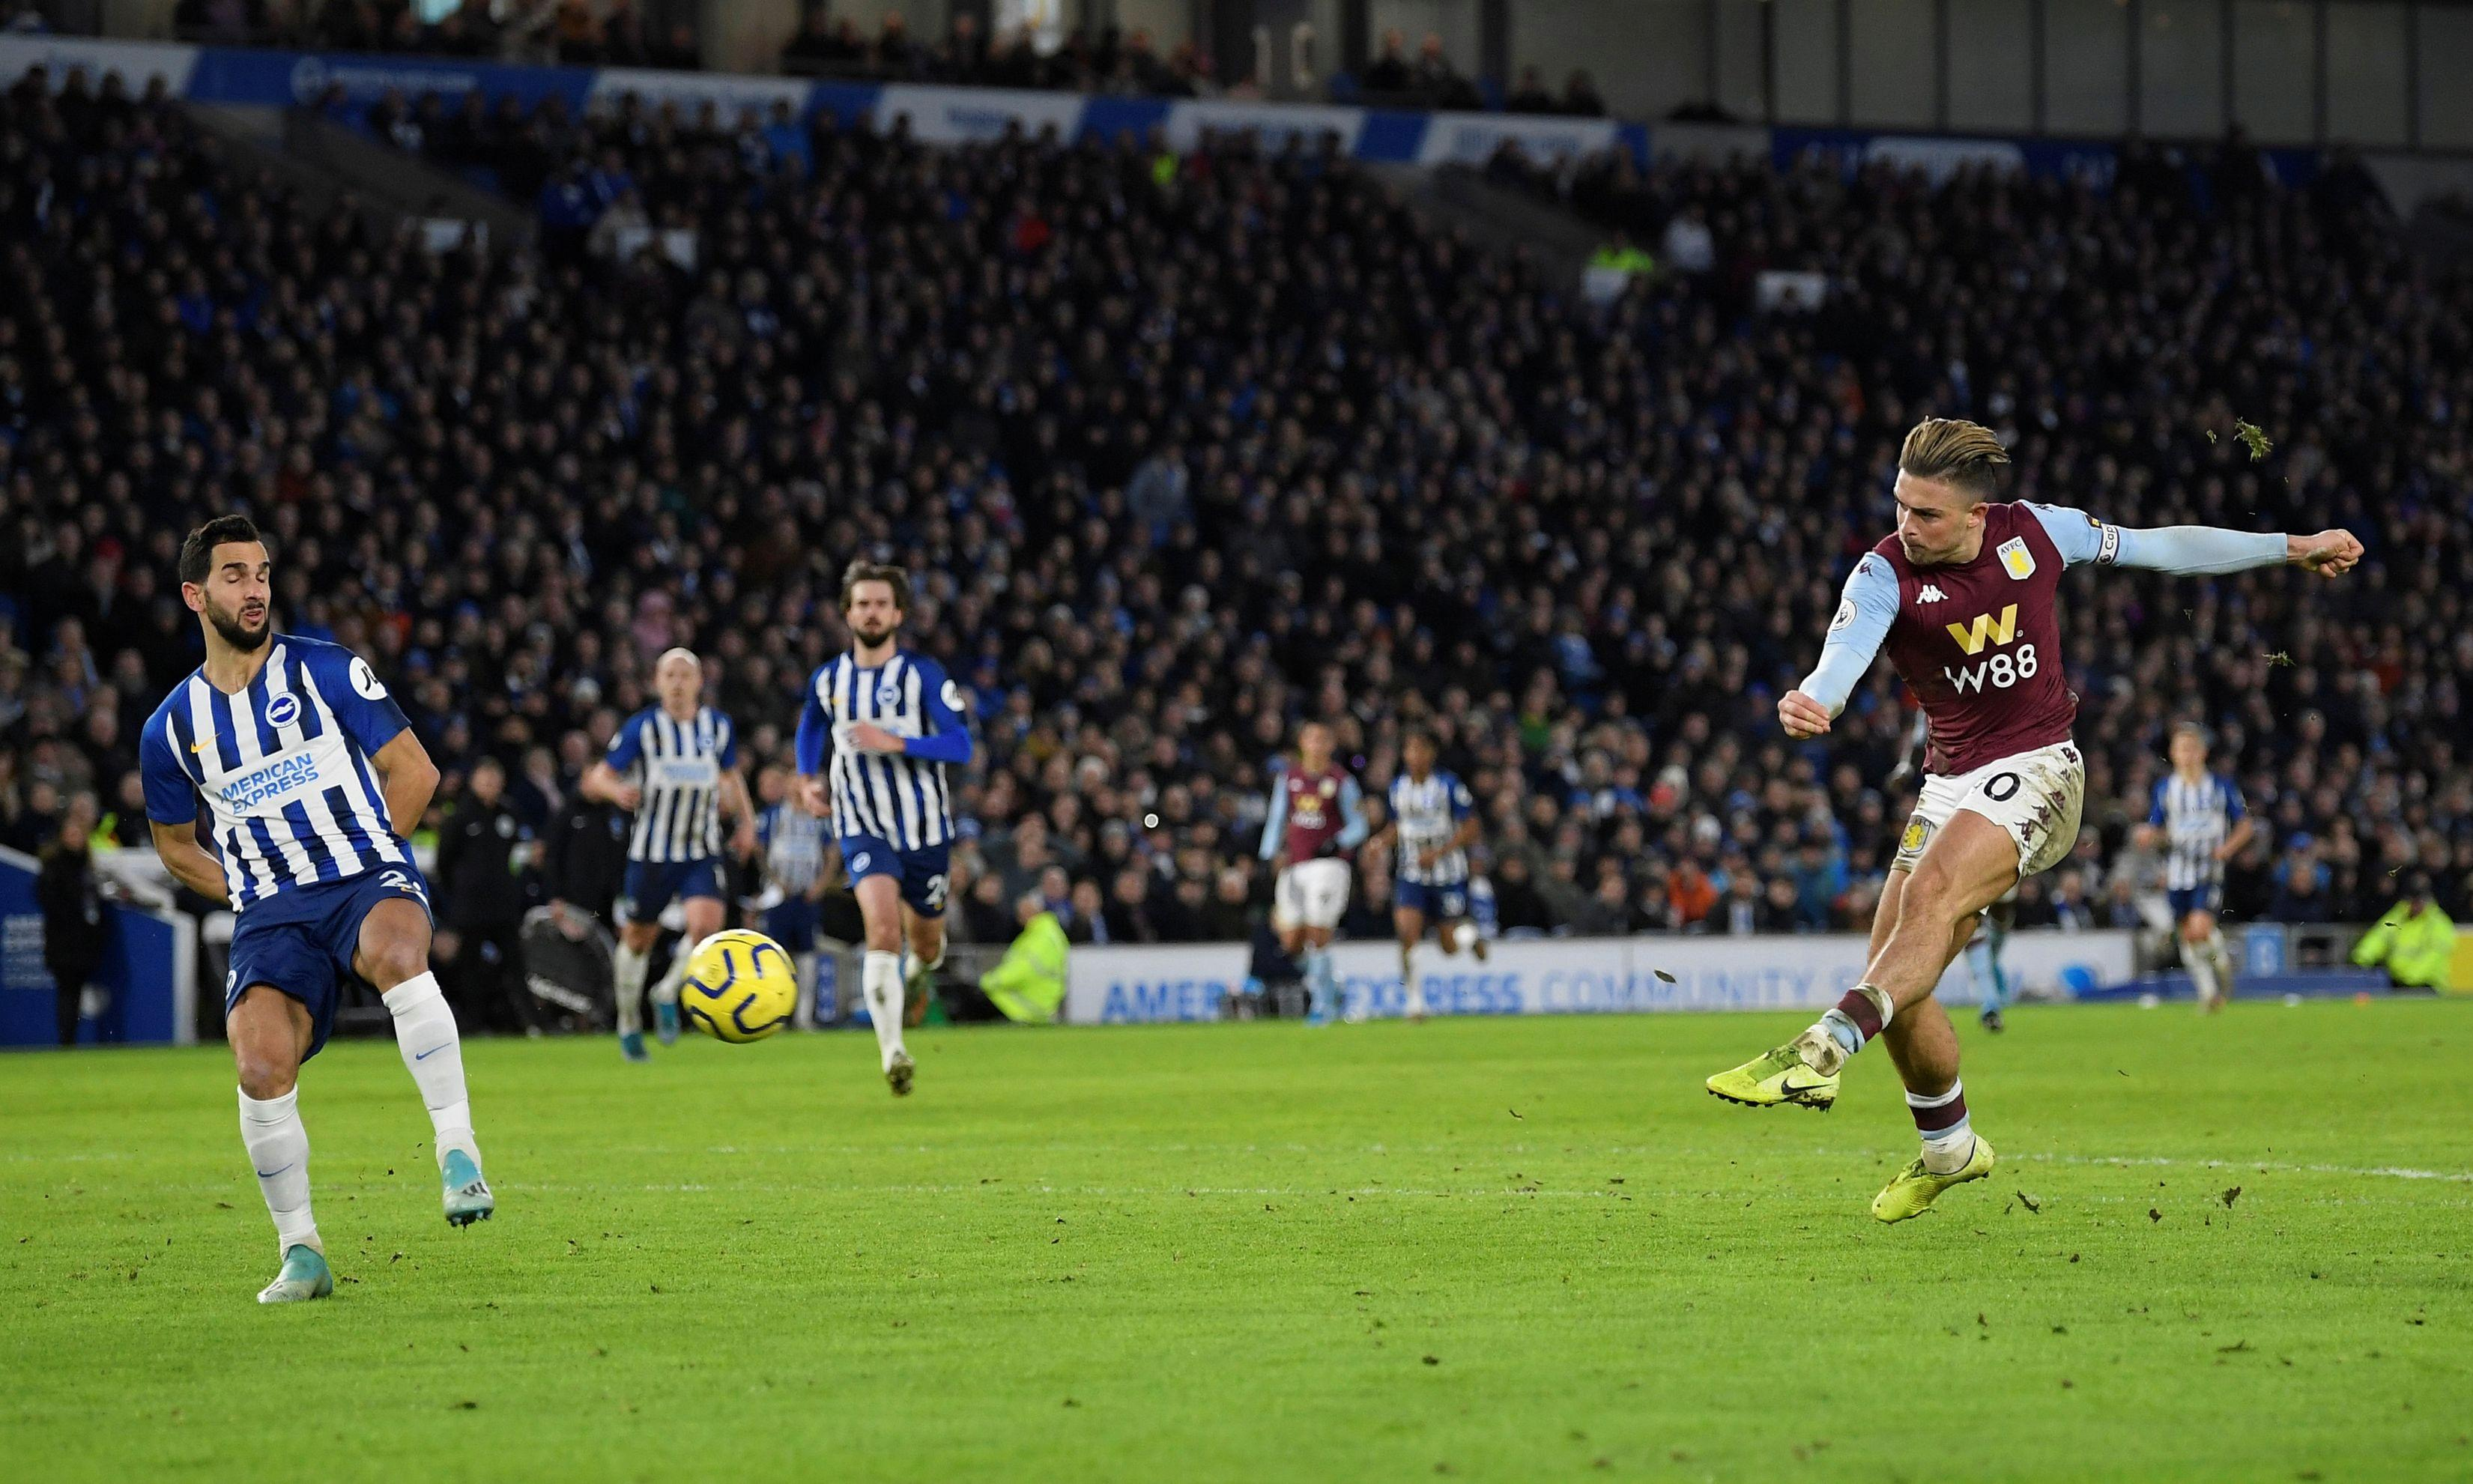 Jack Grealish's strike earns Aston Villa a priceless point at Brighton